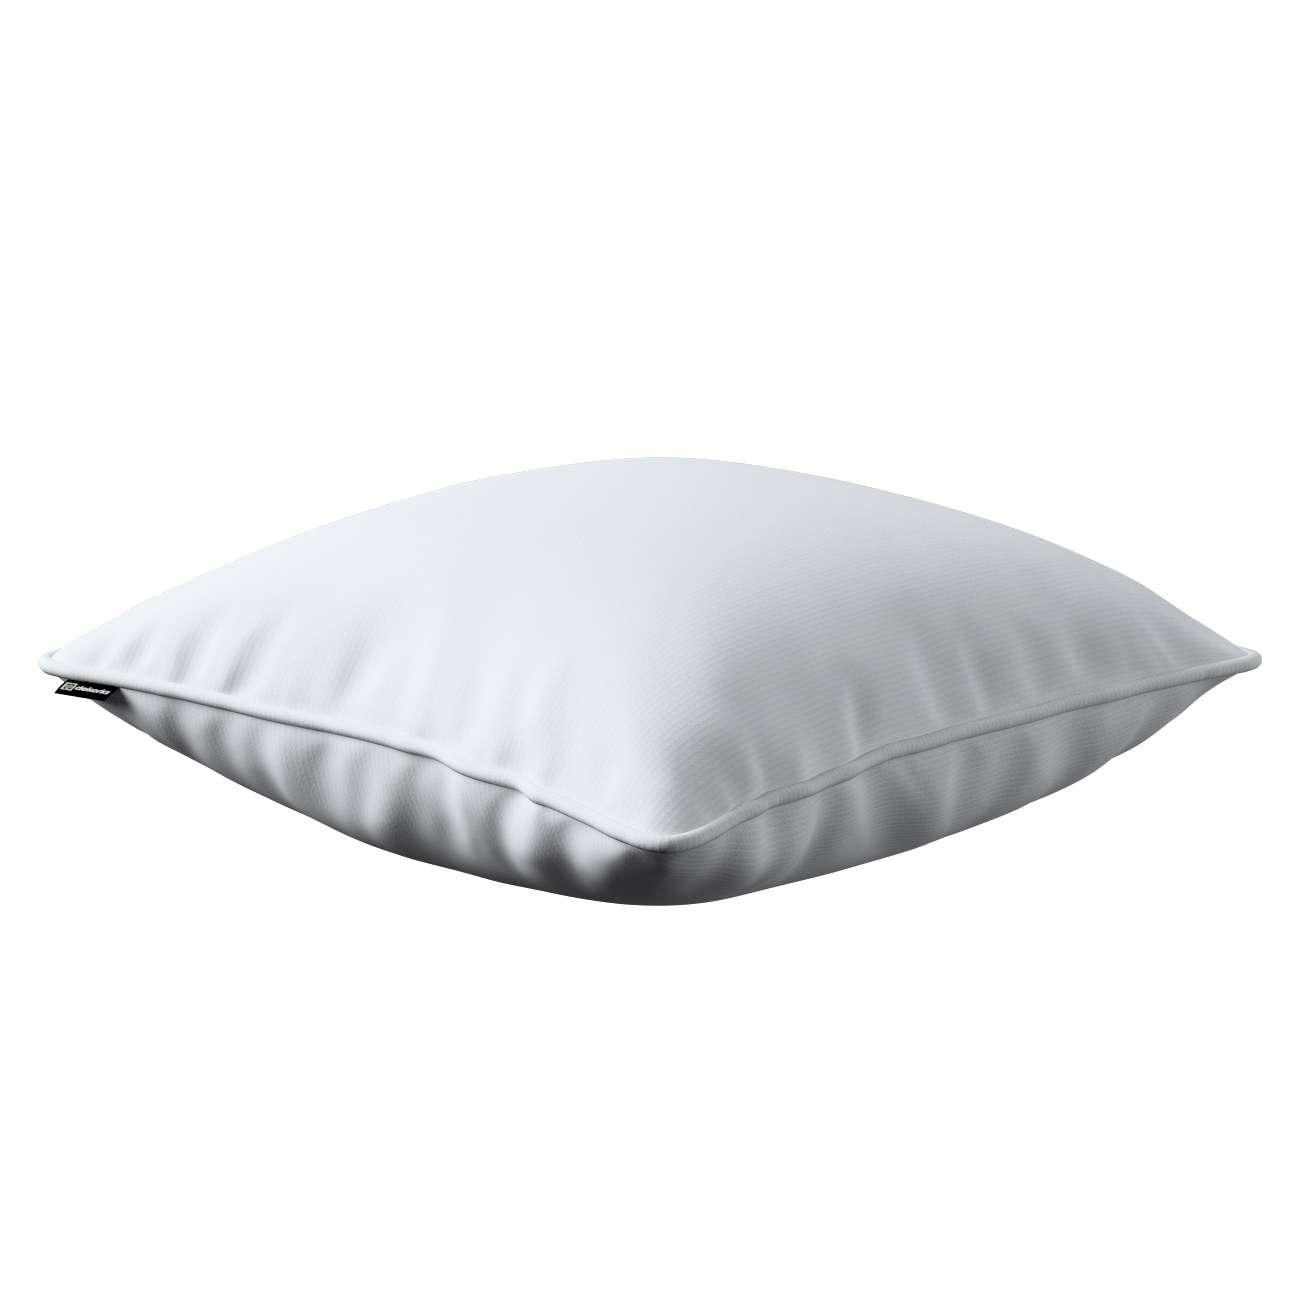 Poszewka Gabi na poduszkę w kolekcji Jupiter, tkanina: 127-01